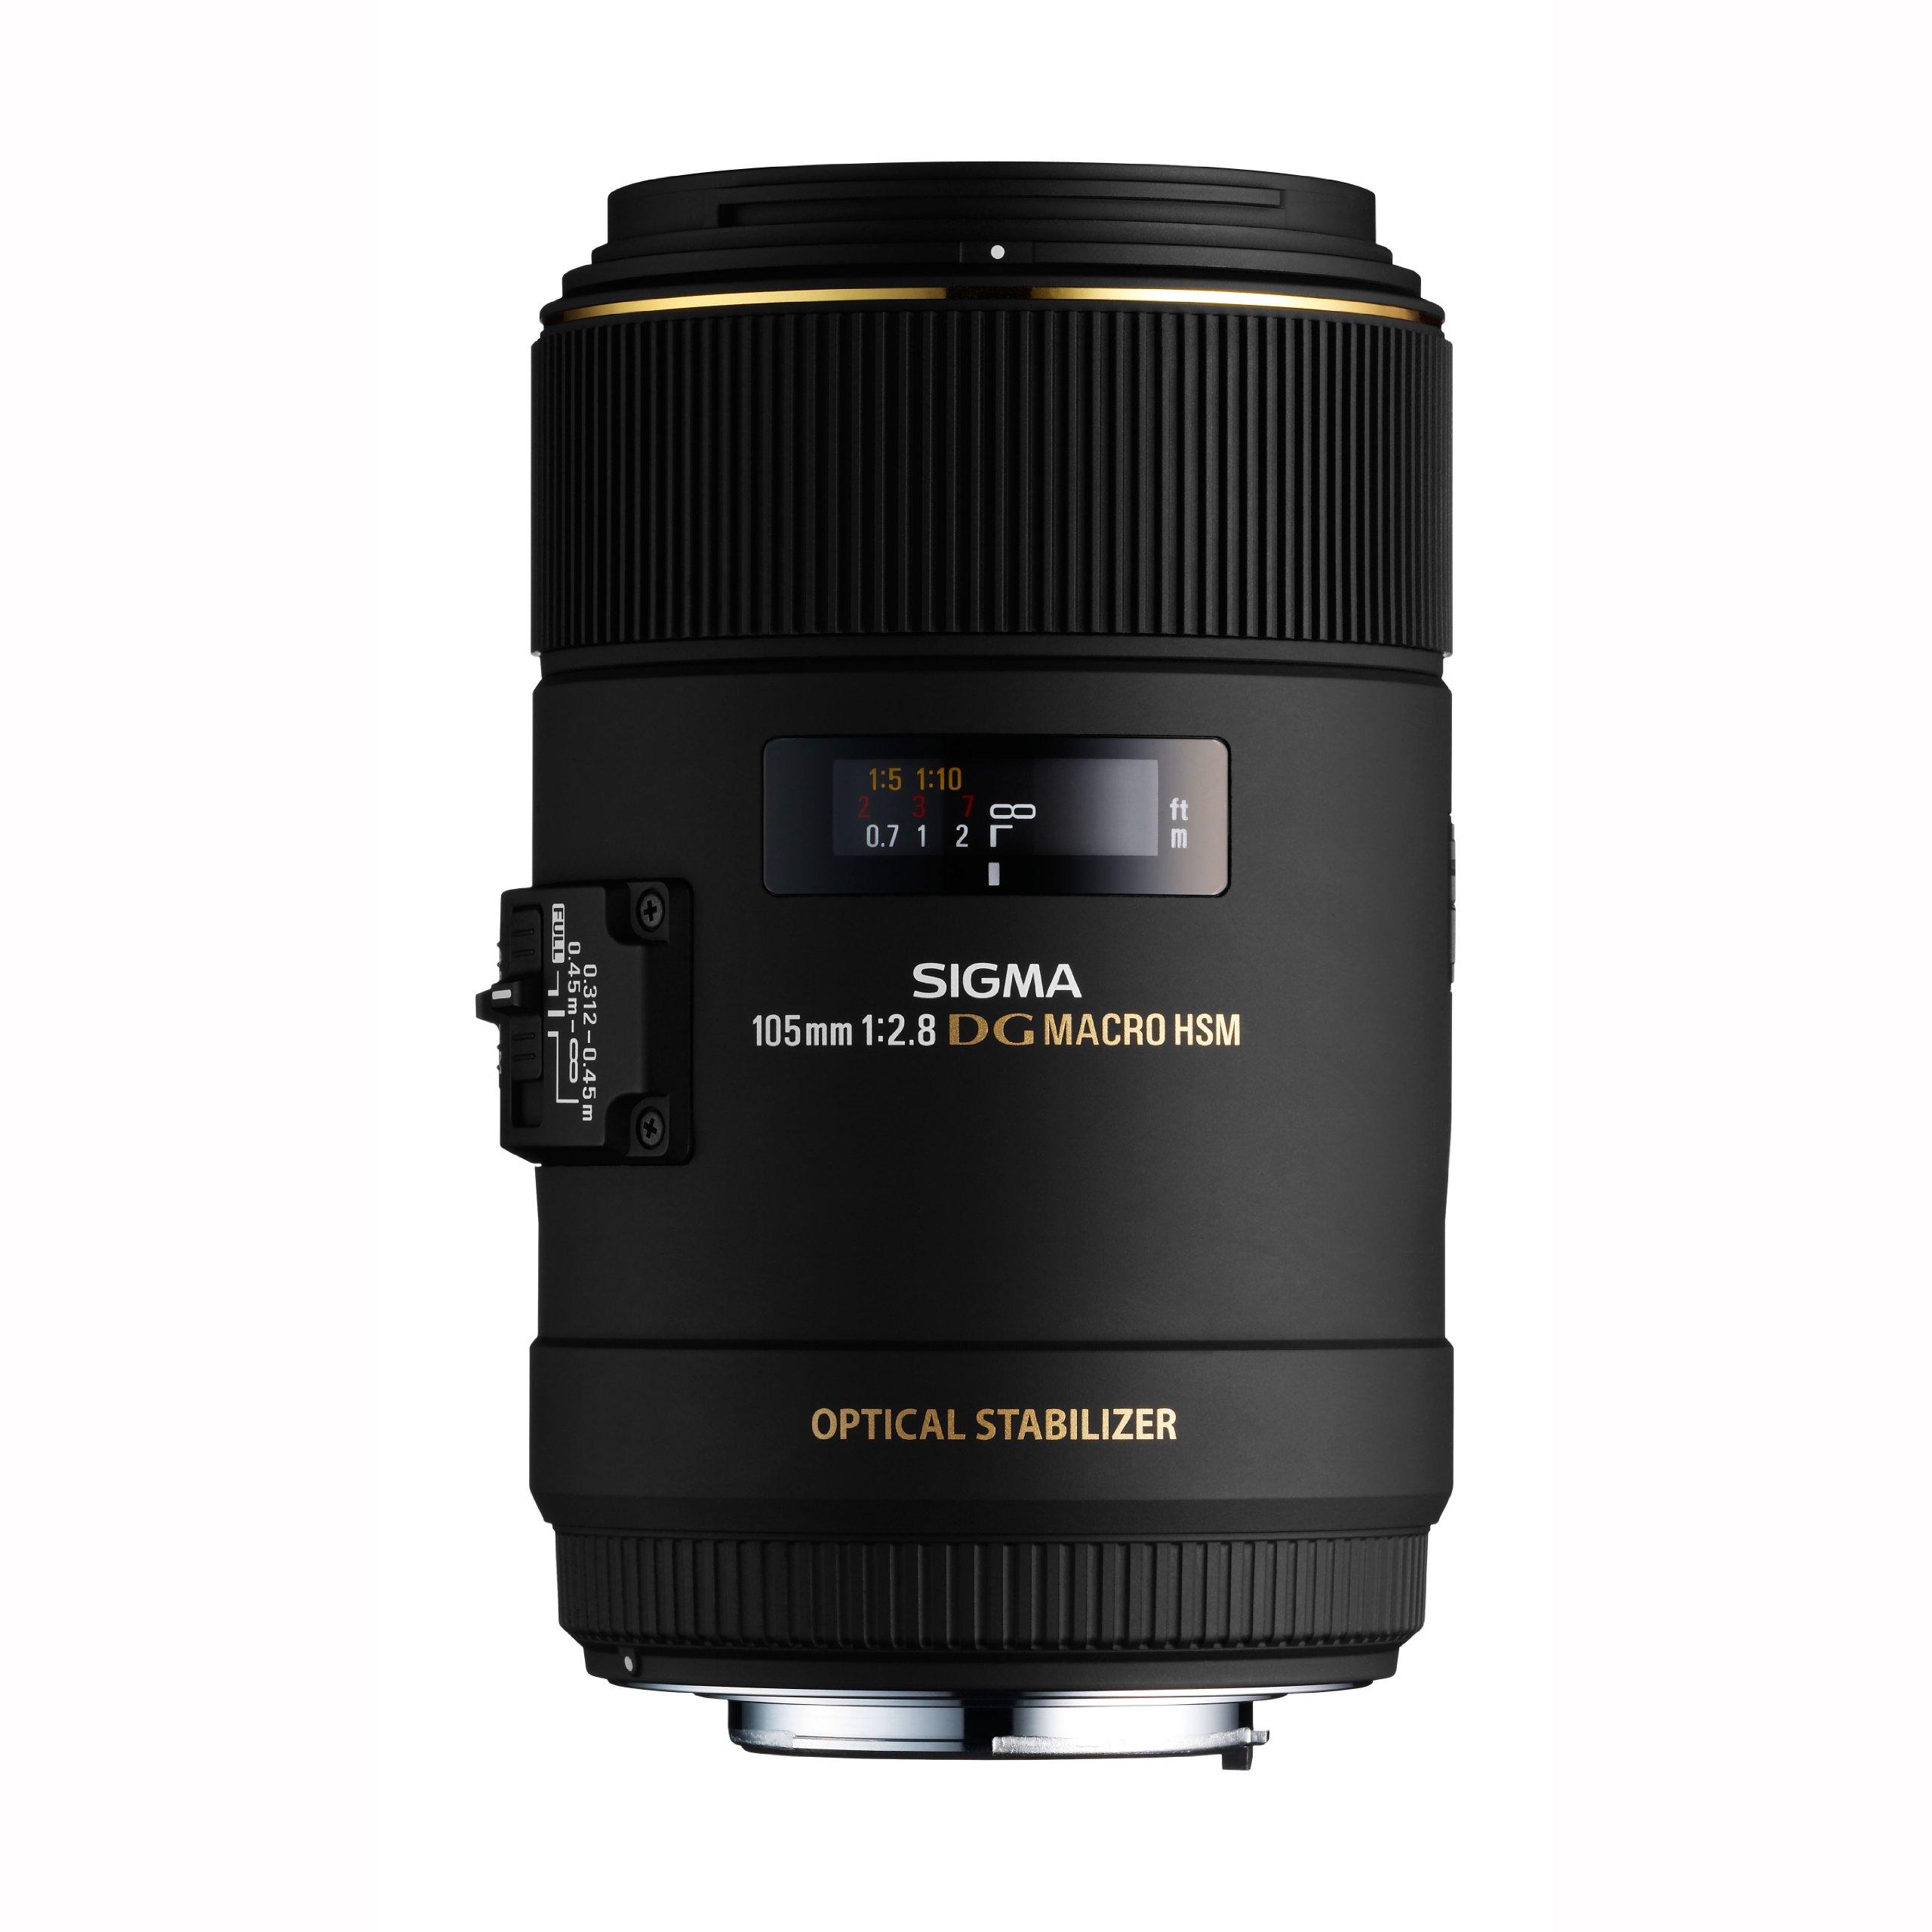 Sigma 105mm f/2.8 EX DG OS HSM Macro Lens Canon DSLR Cameras product image